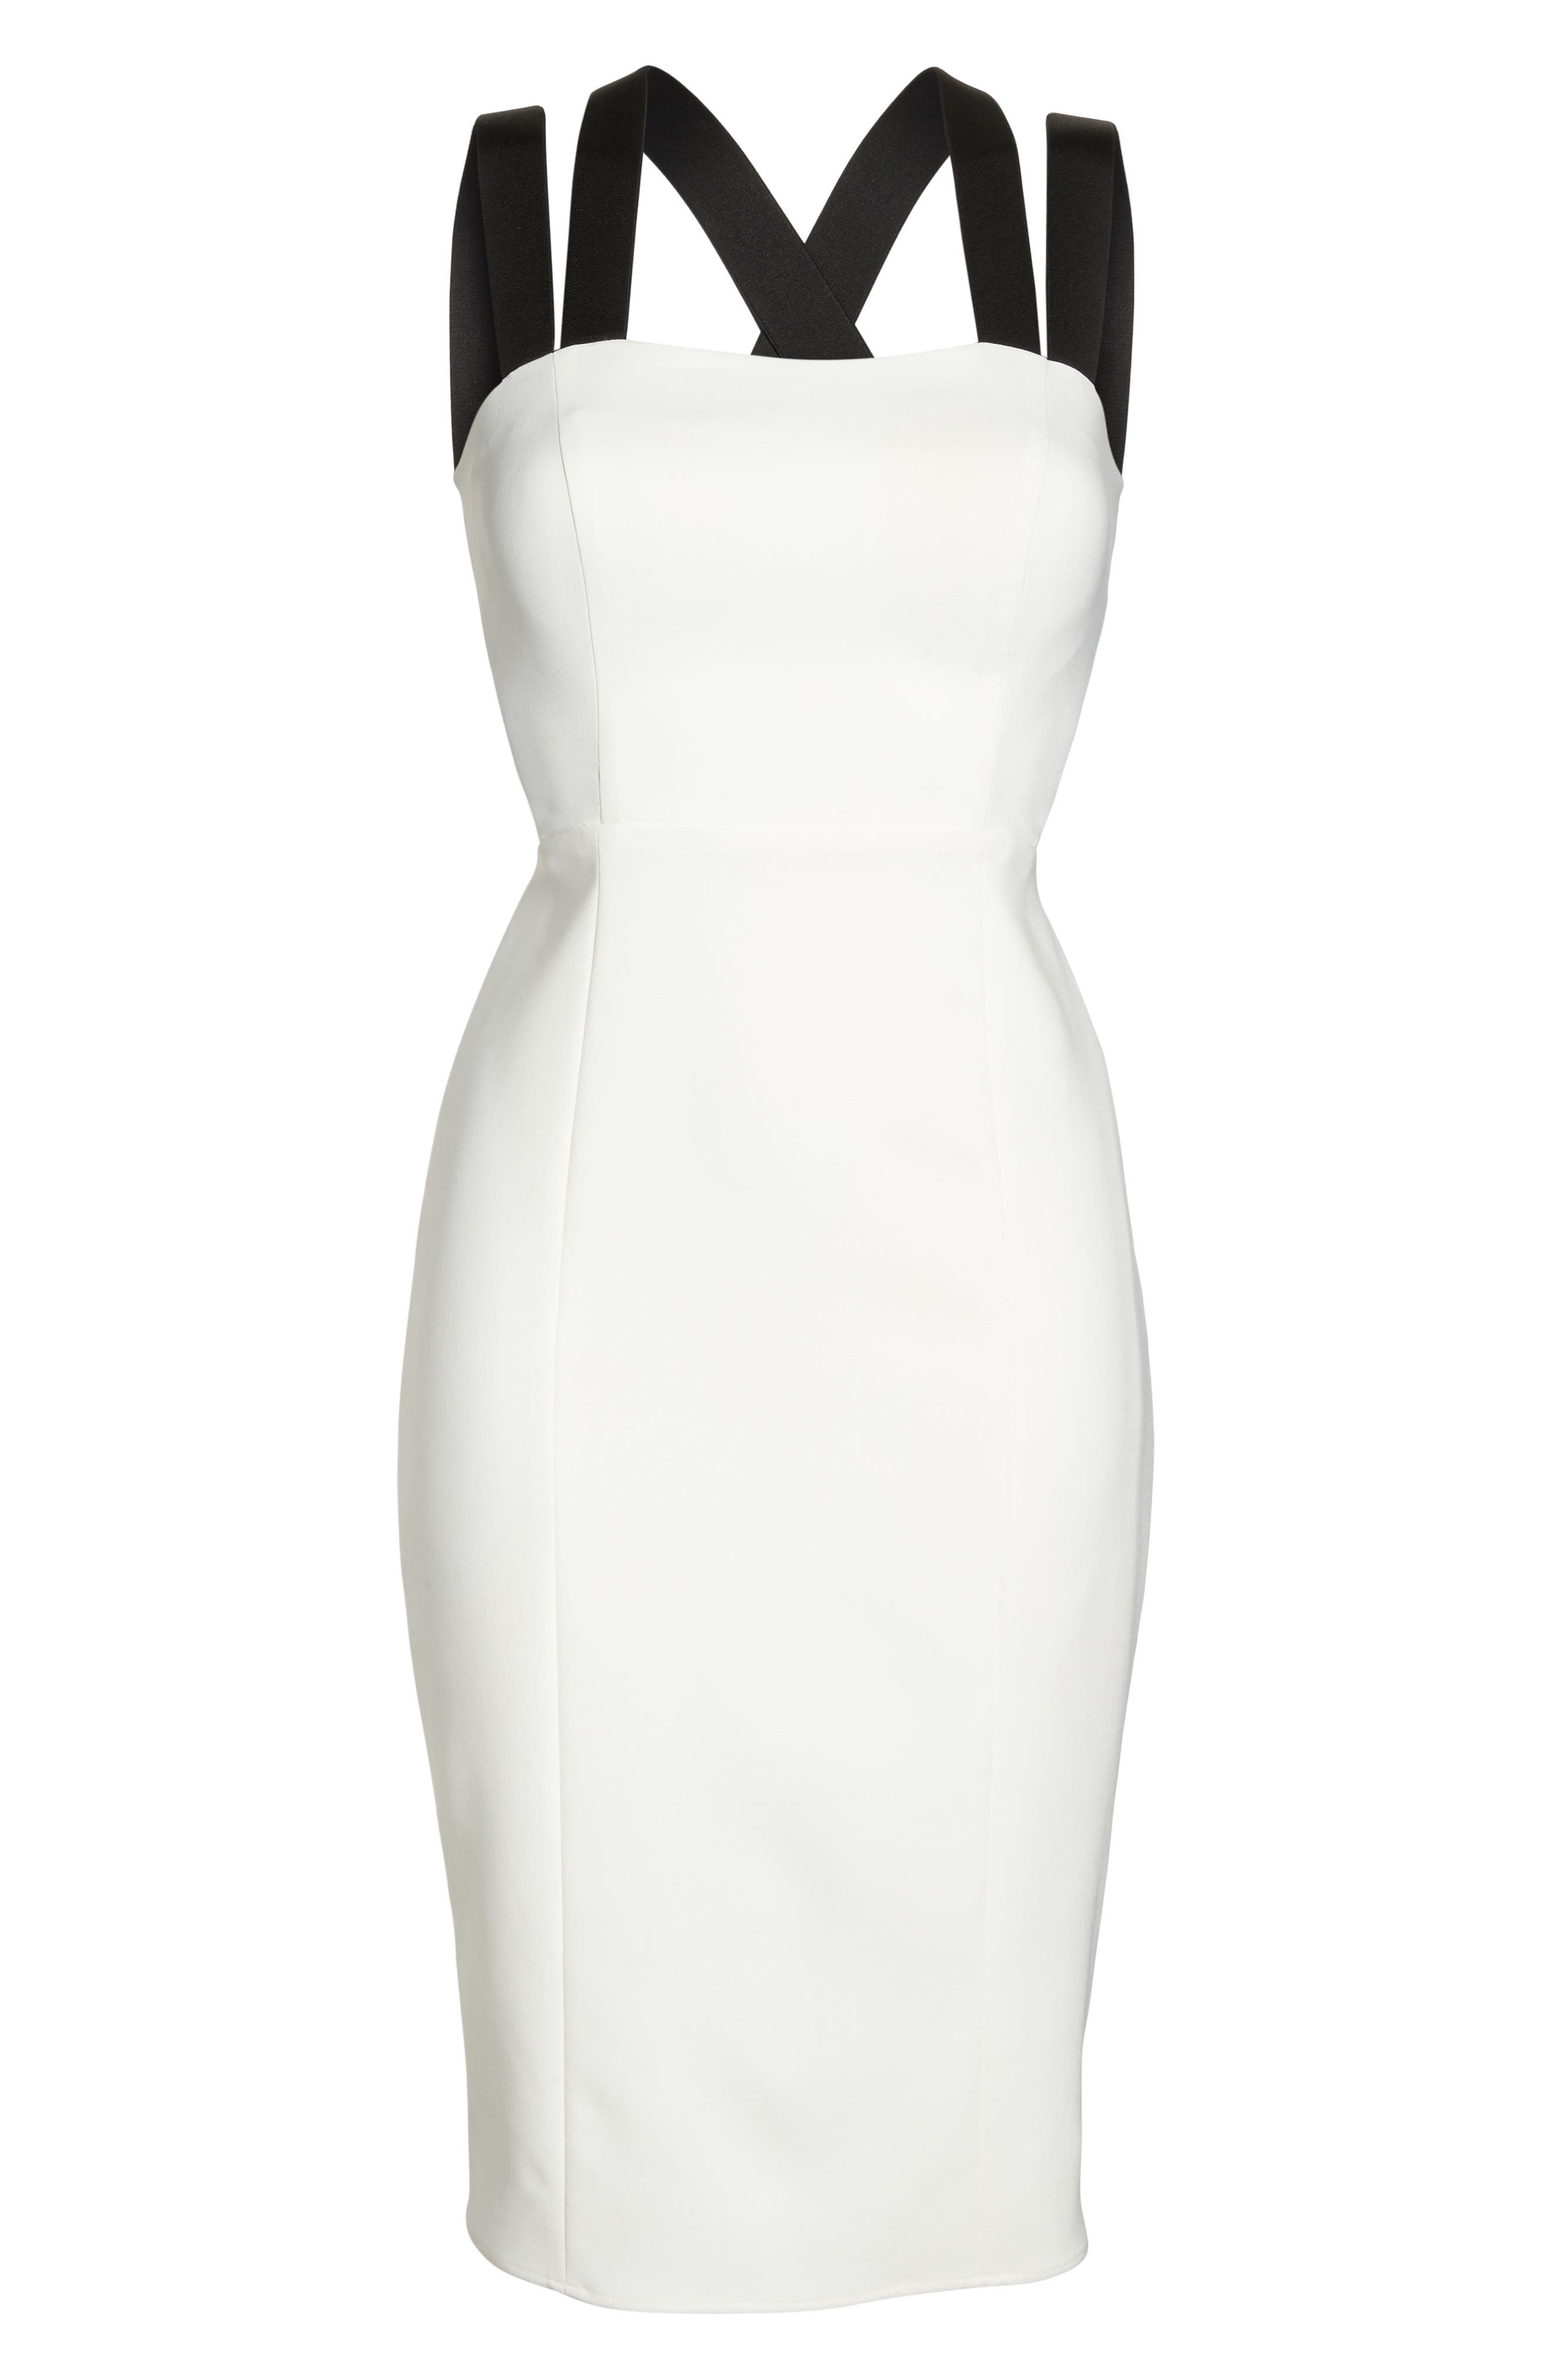 Kate Elastic Strap Cutout Sheath Dress,                             Alternate thumbnail 6, color,                             902